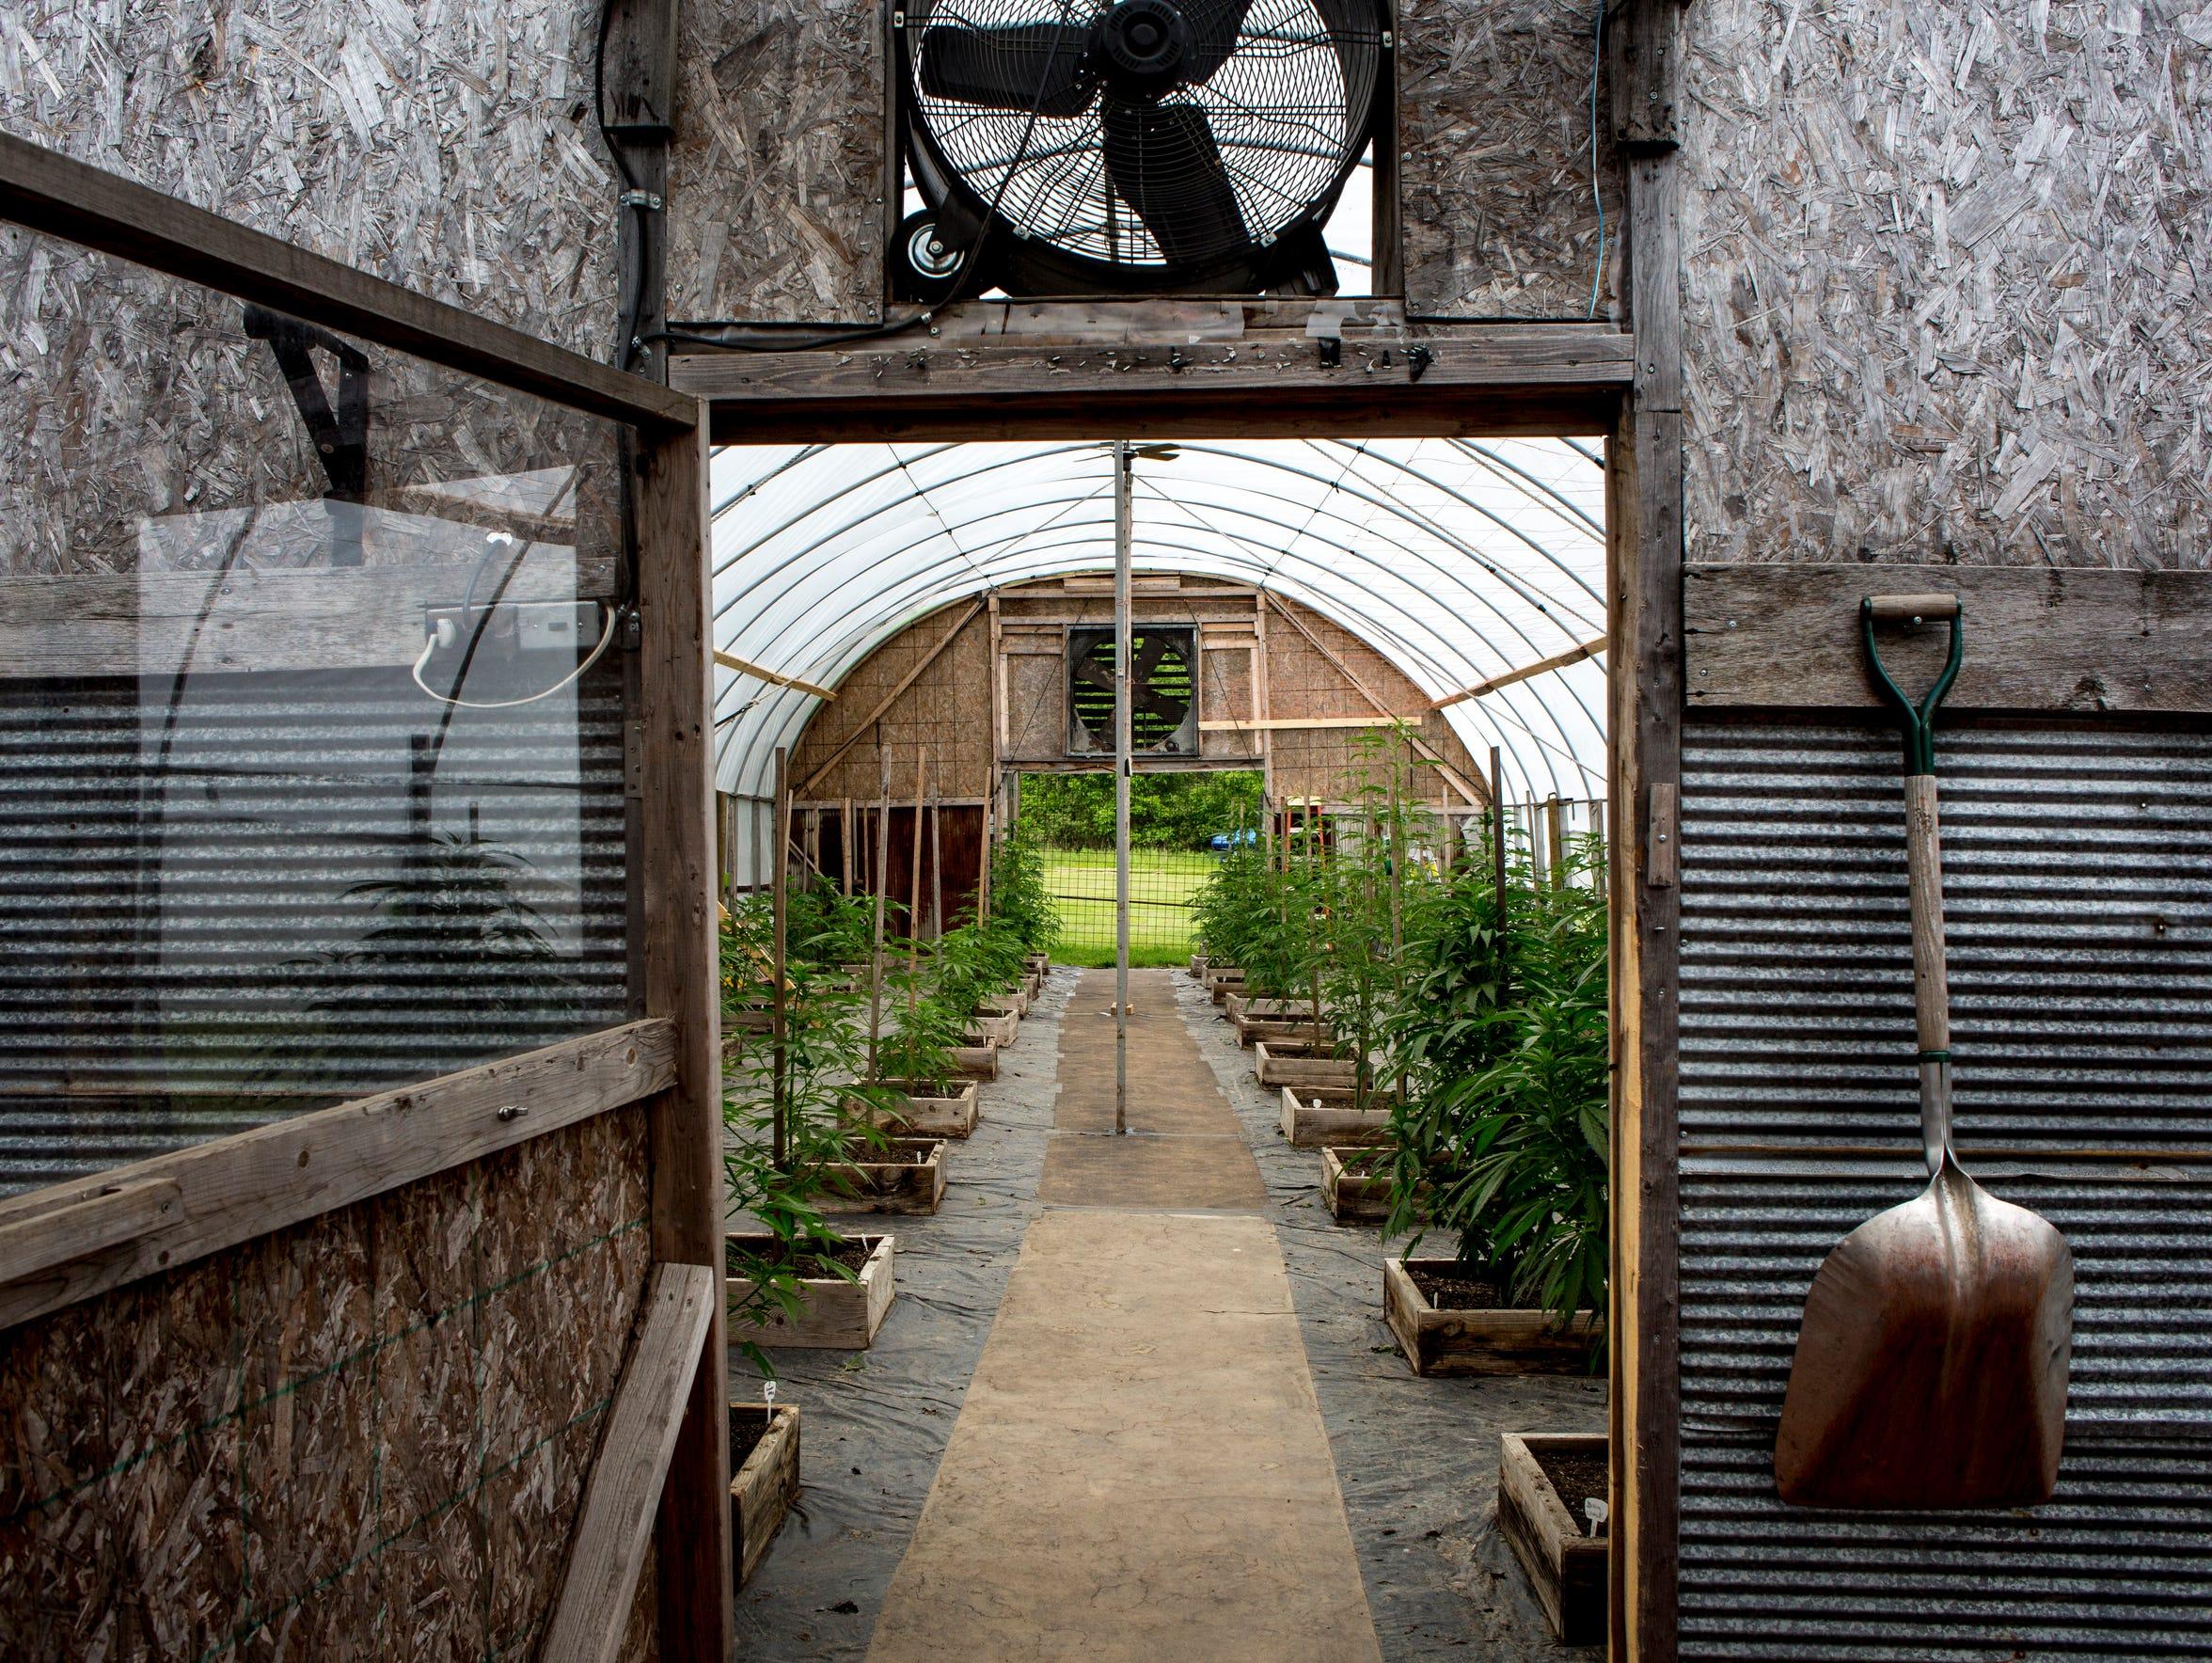 Medical marijuana plants are seen growing at Tom Owens'